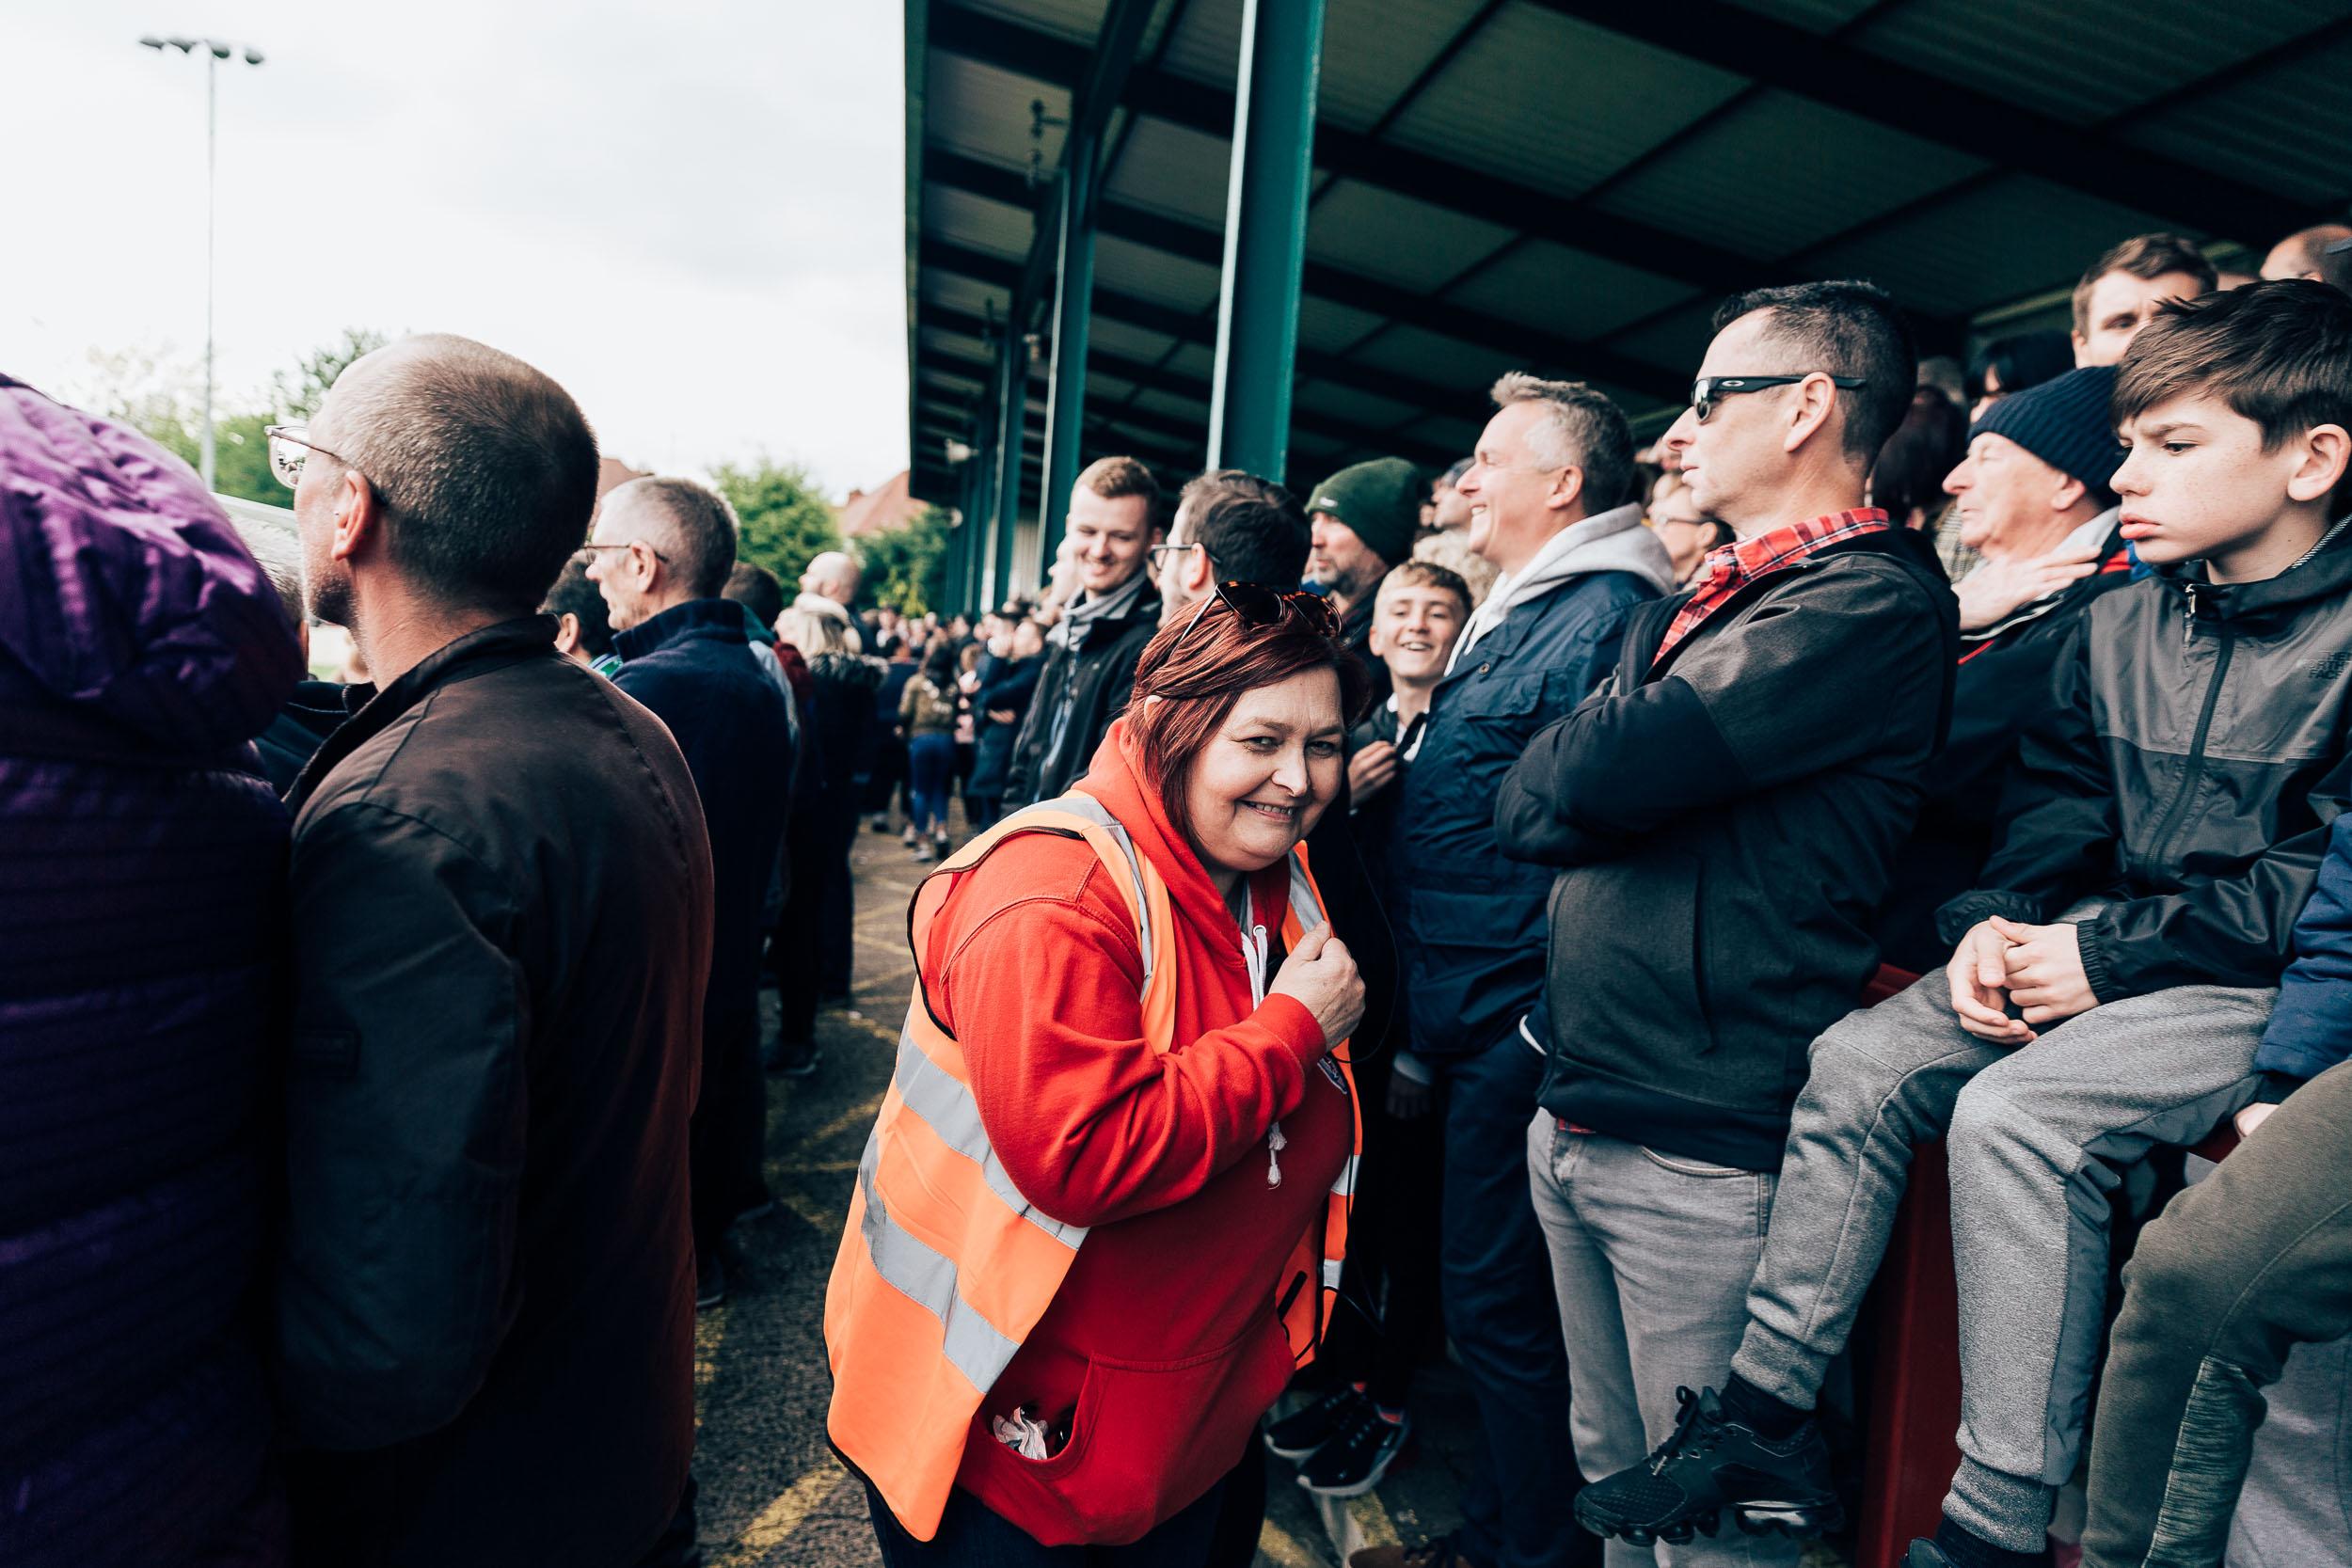 06_05_2019_Bromsgrove_Sporting_Corby-118.jpg